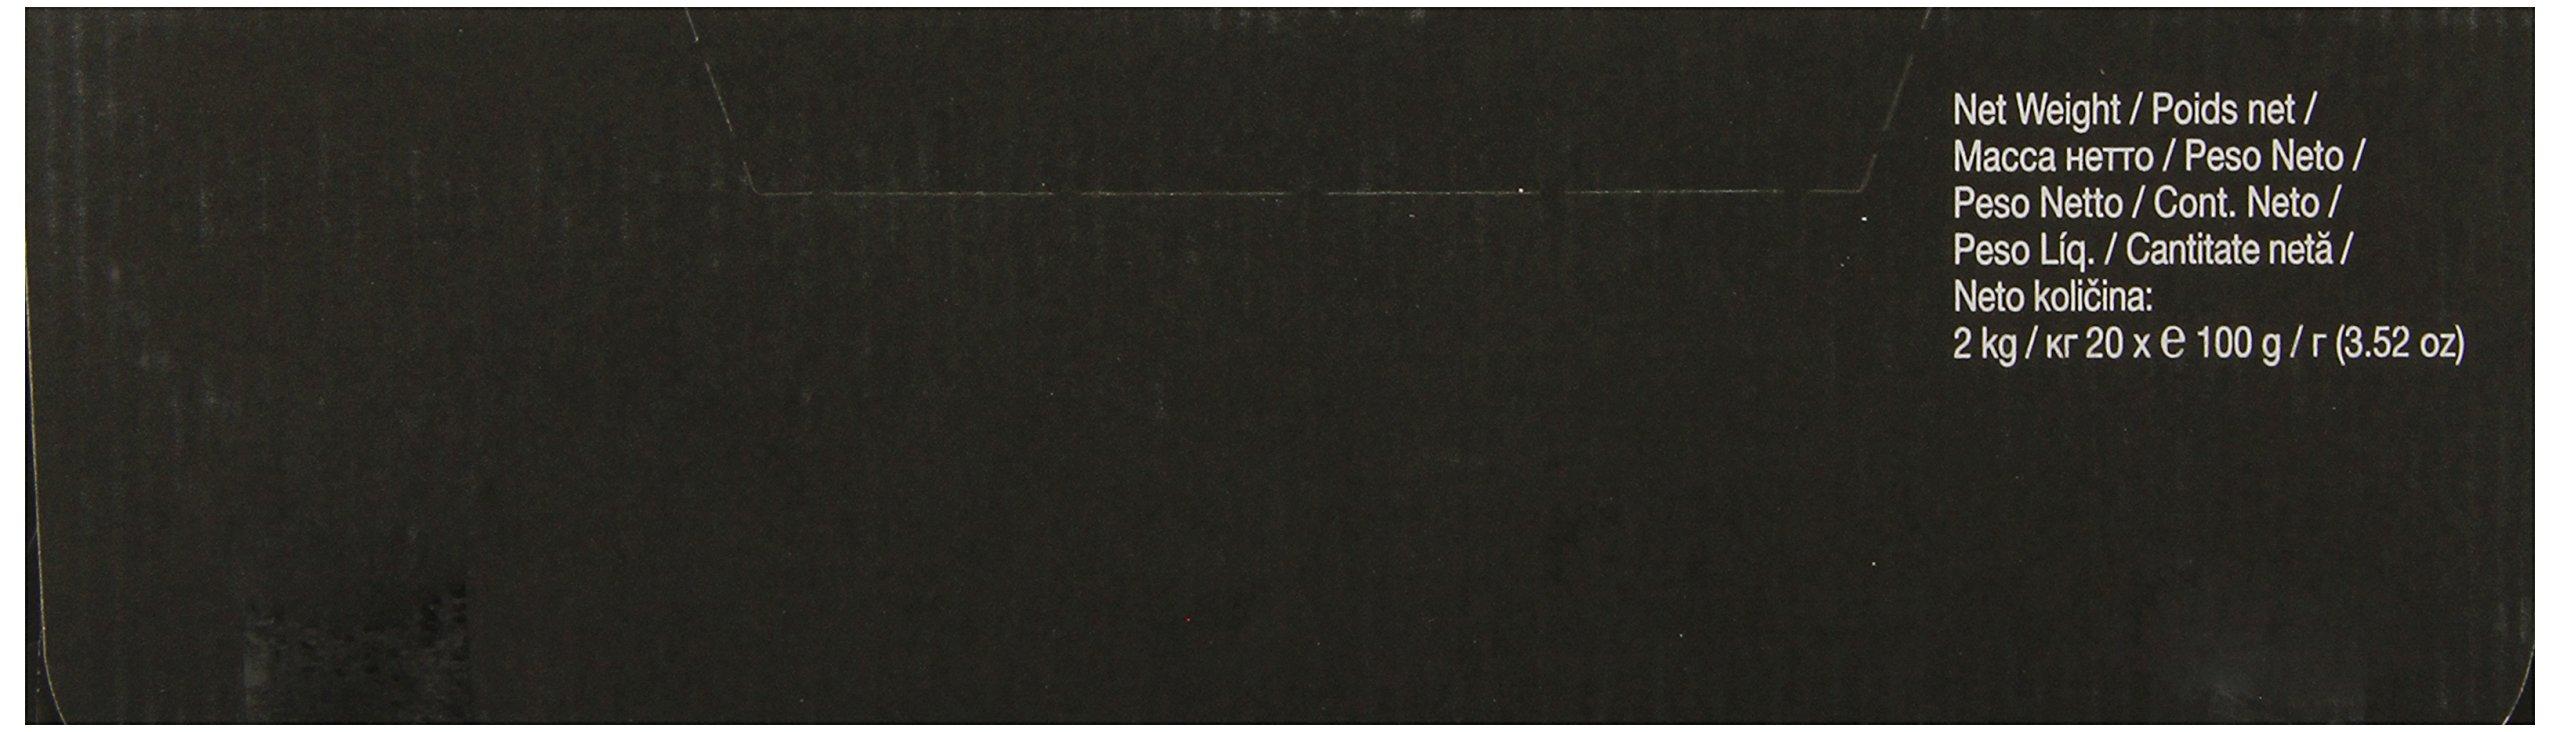 Toblerone Chocolate Bar, Dark, 3.52 Ounce (Pack of 20) by Toblerone (Image #6)